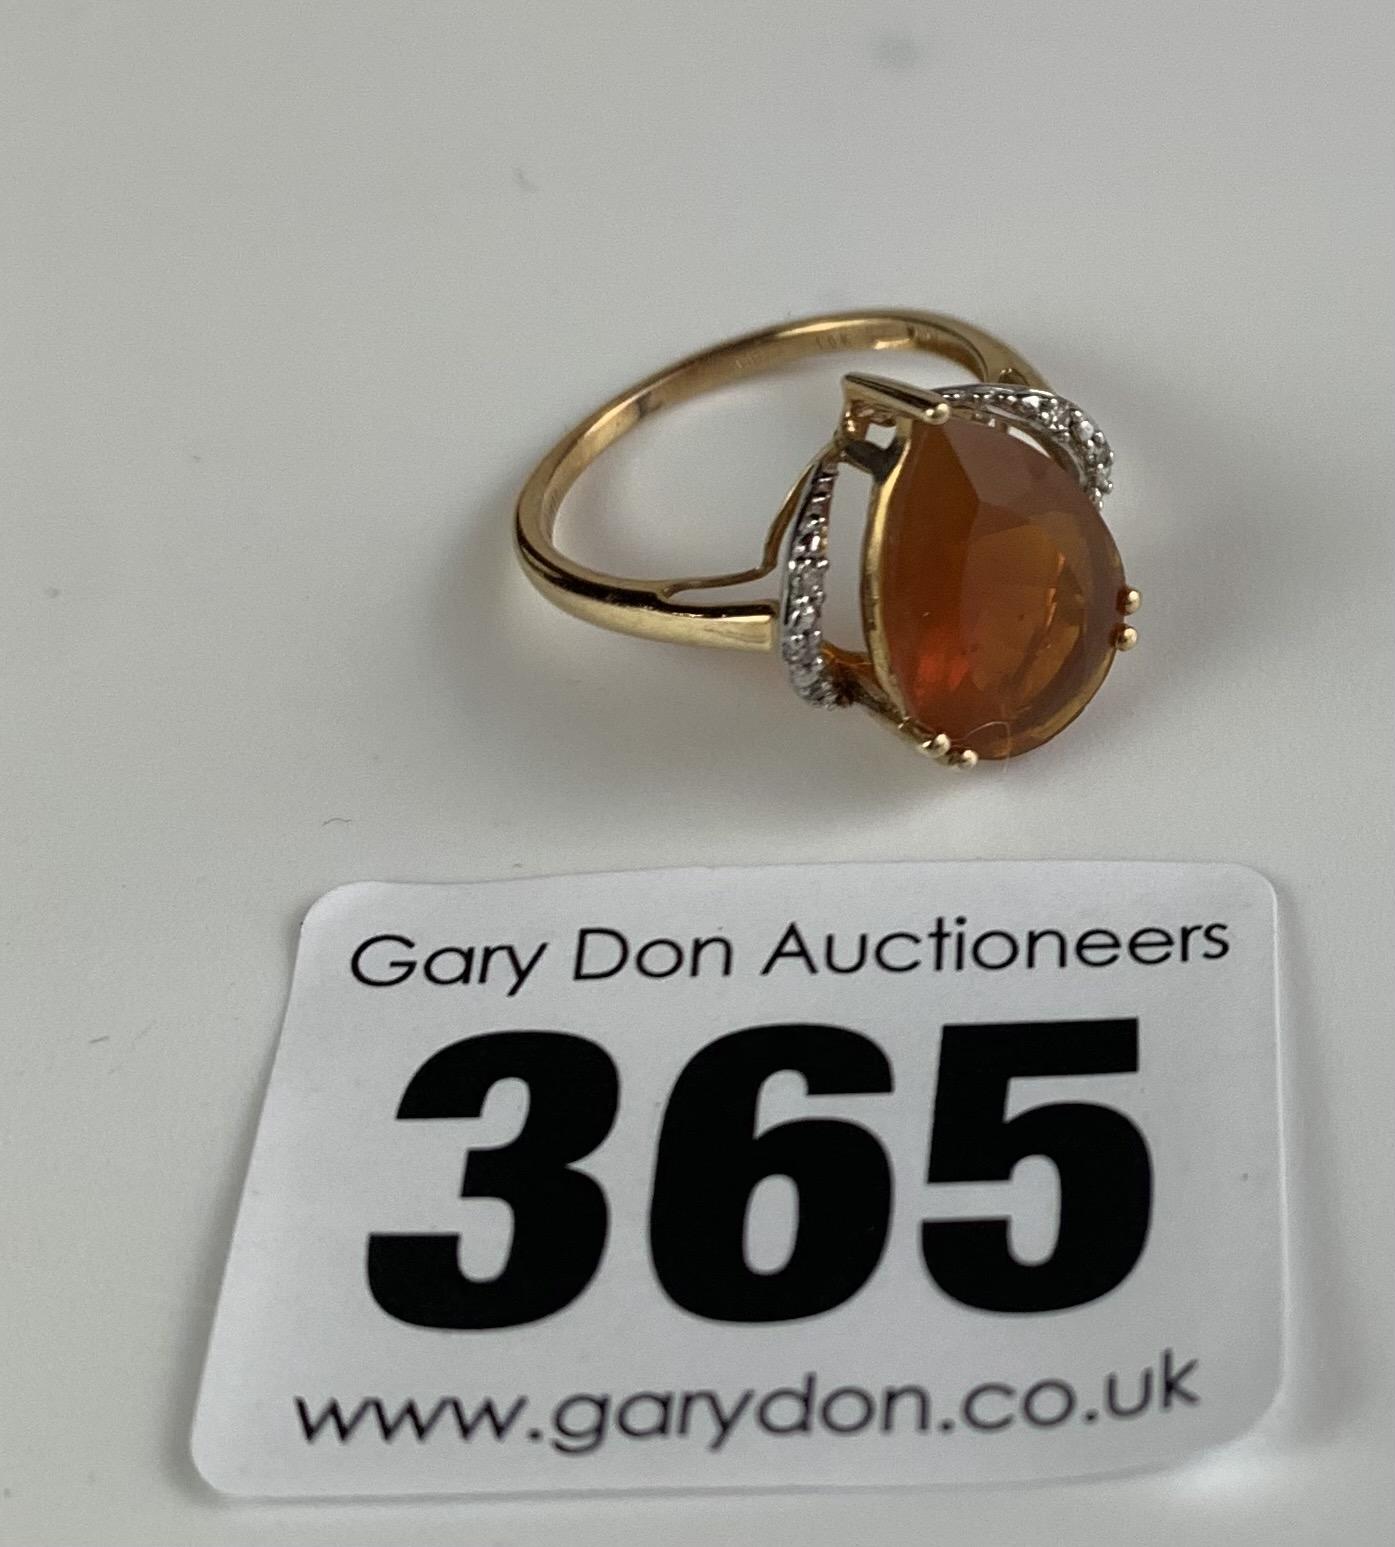 10k gold ring with heart shaped orange stone, size J/K, w: 2.1 gms - Image 3 of 6